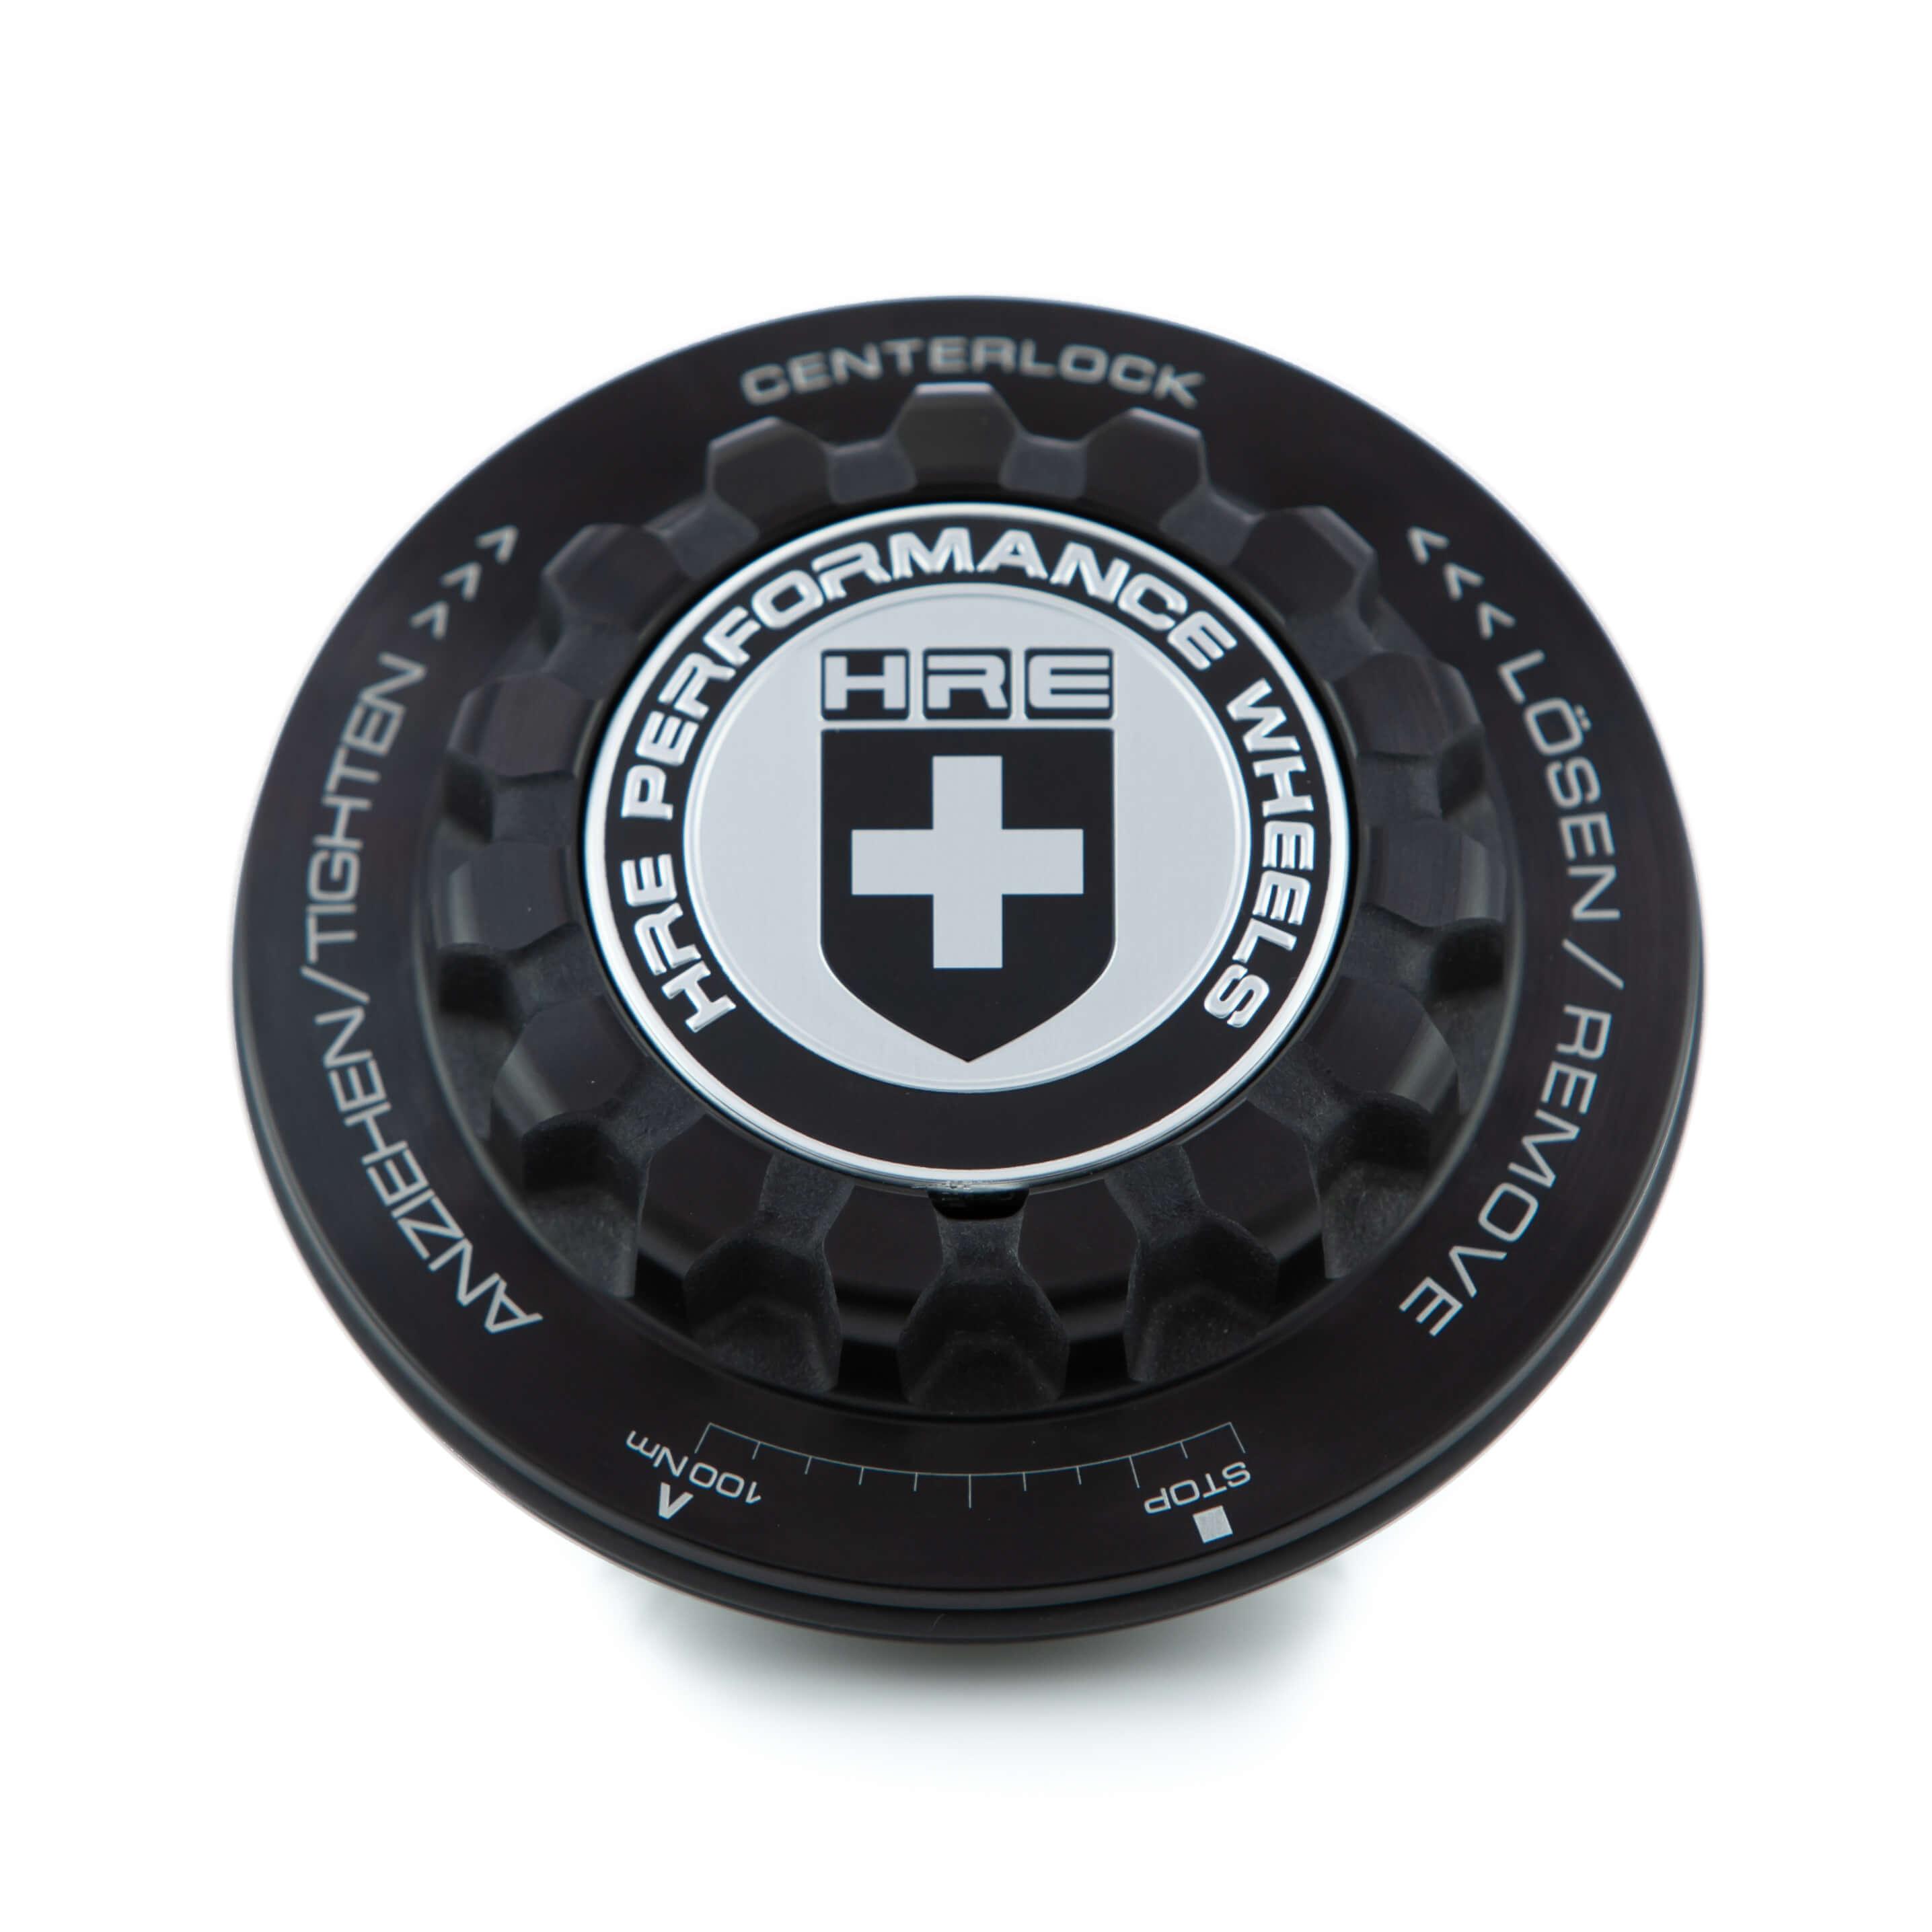 Center Lock Caps - Classic Black/Gray | HRE Performance Wheels